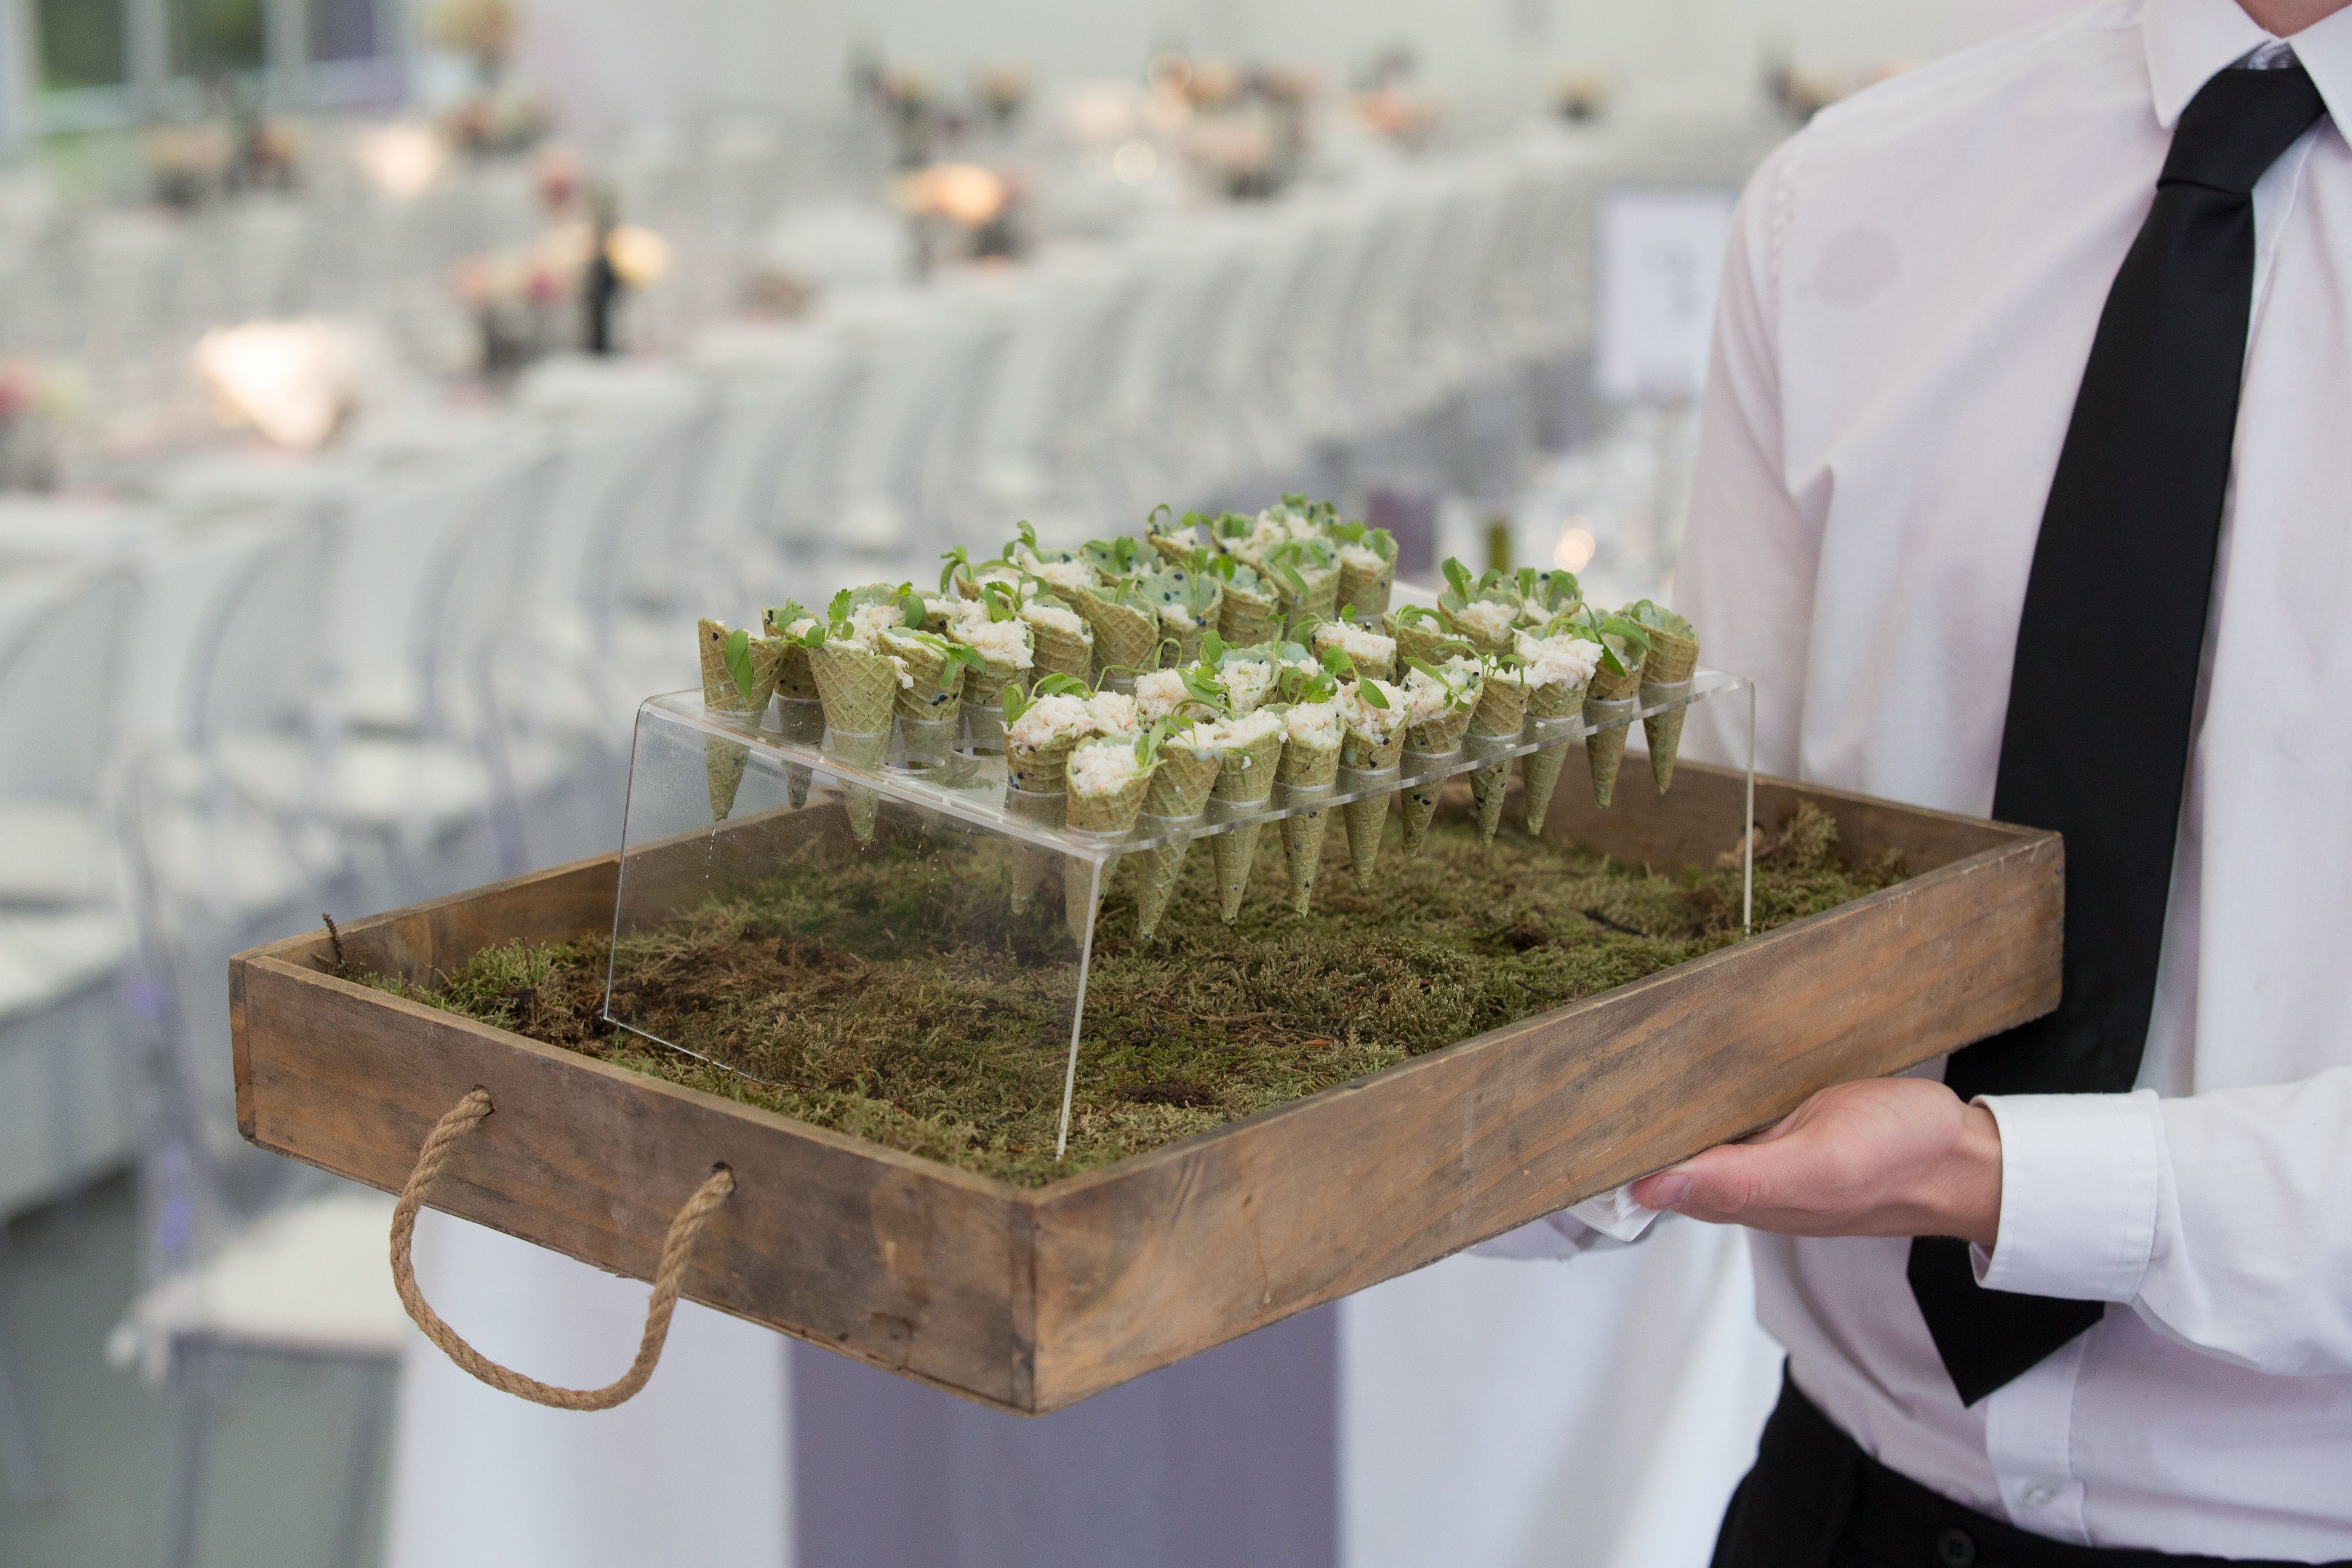 Crab canapés  #canapés #pesto #crab #seasonal #local #delicious #perfect #caterers #bestofbritish #events #London #Buckinghamshire #Marlow #corporate #wedding